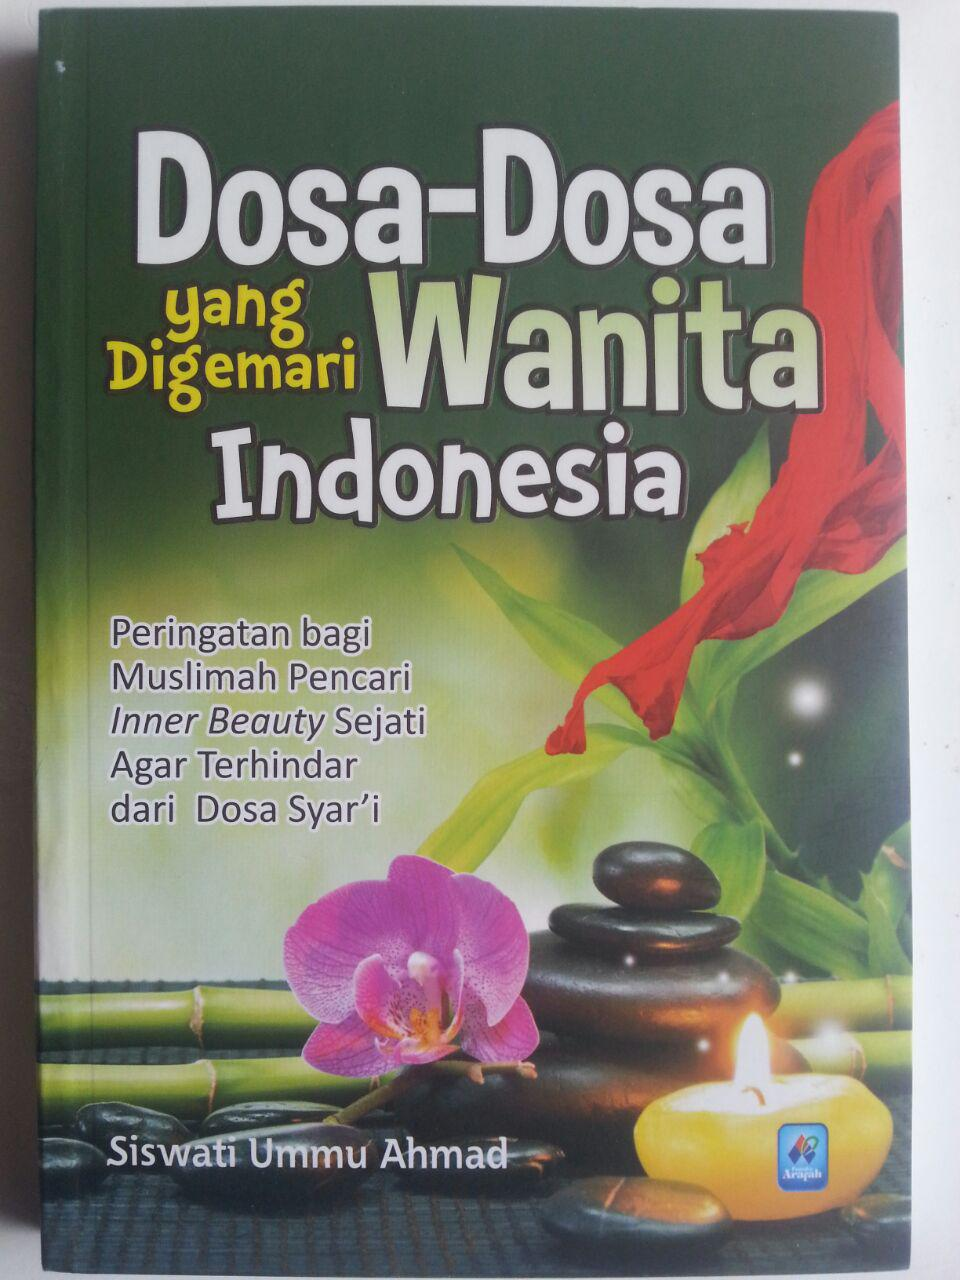 Buku Dosa-Dosa Yang Digemari Wanita Indonesia cover 2